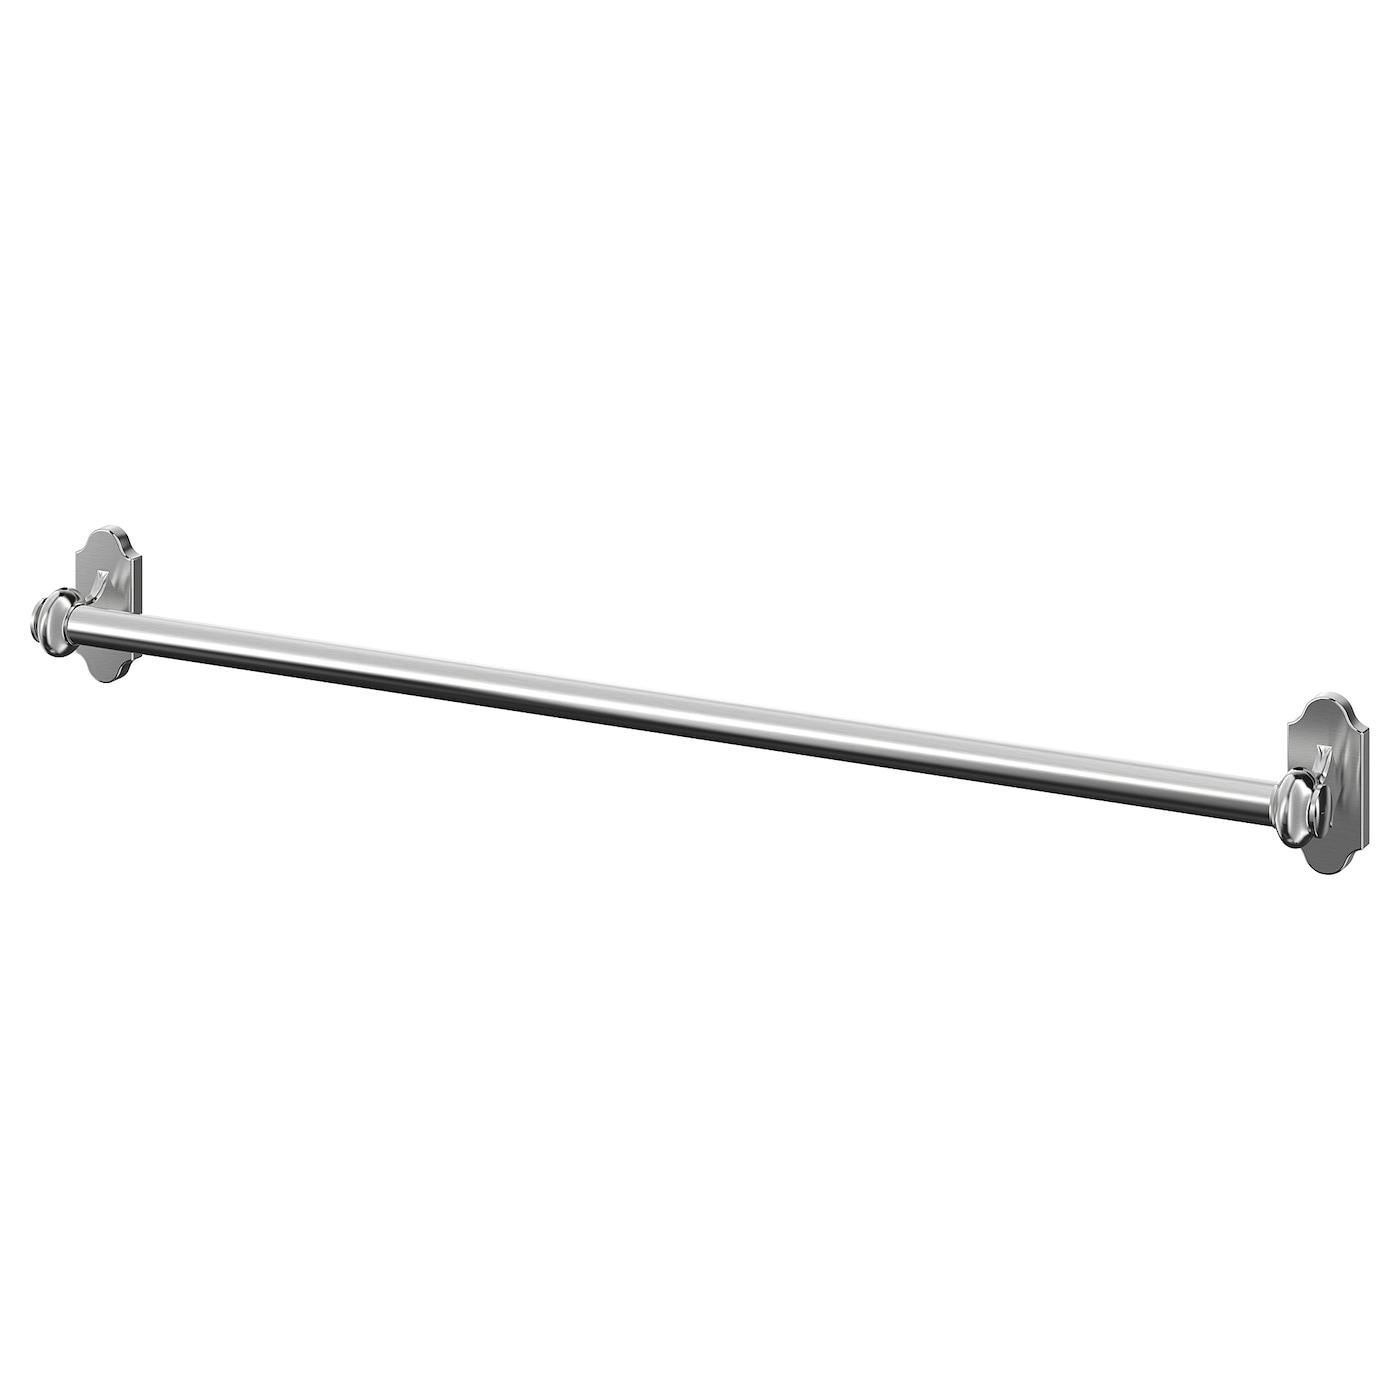 FINTORP Stange vernickelt 57 cm